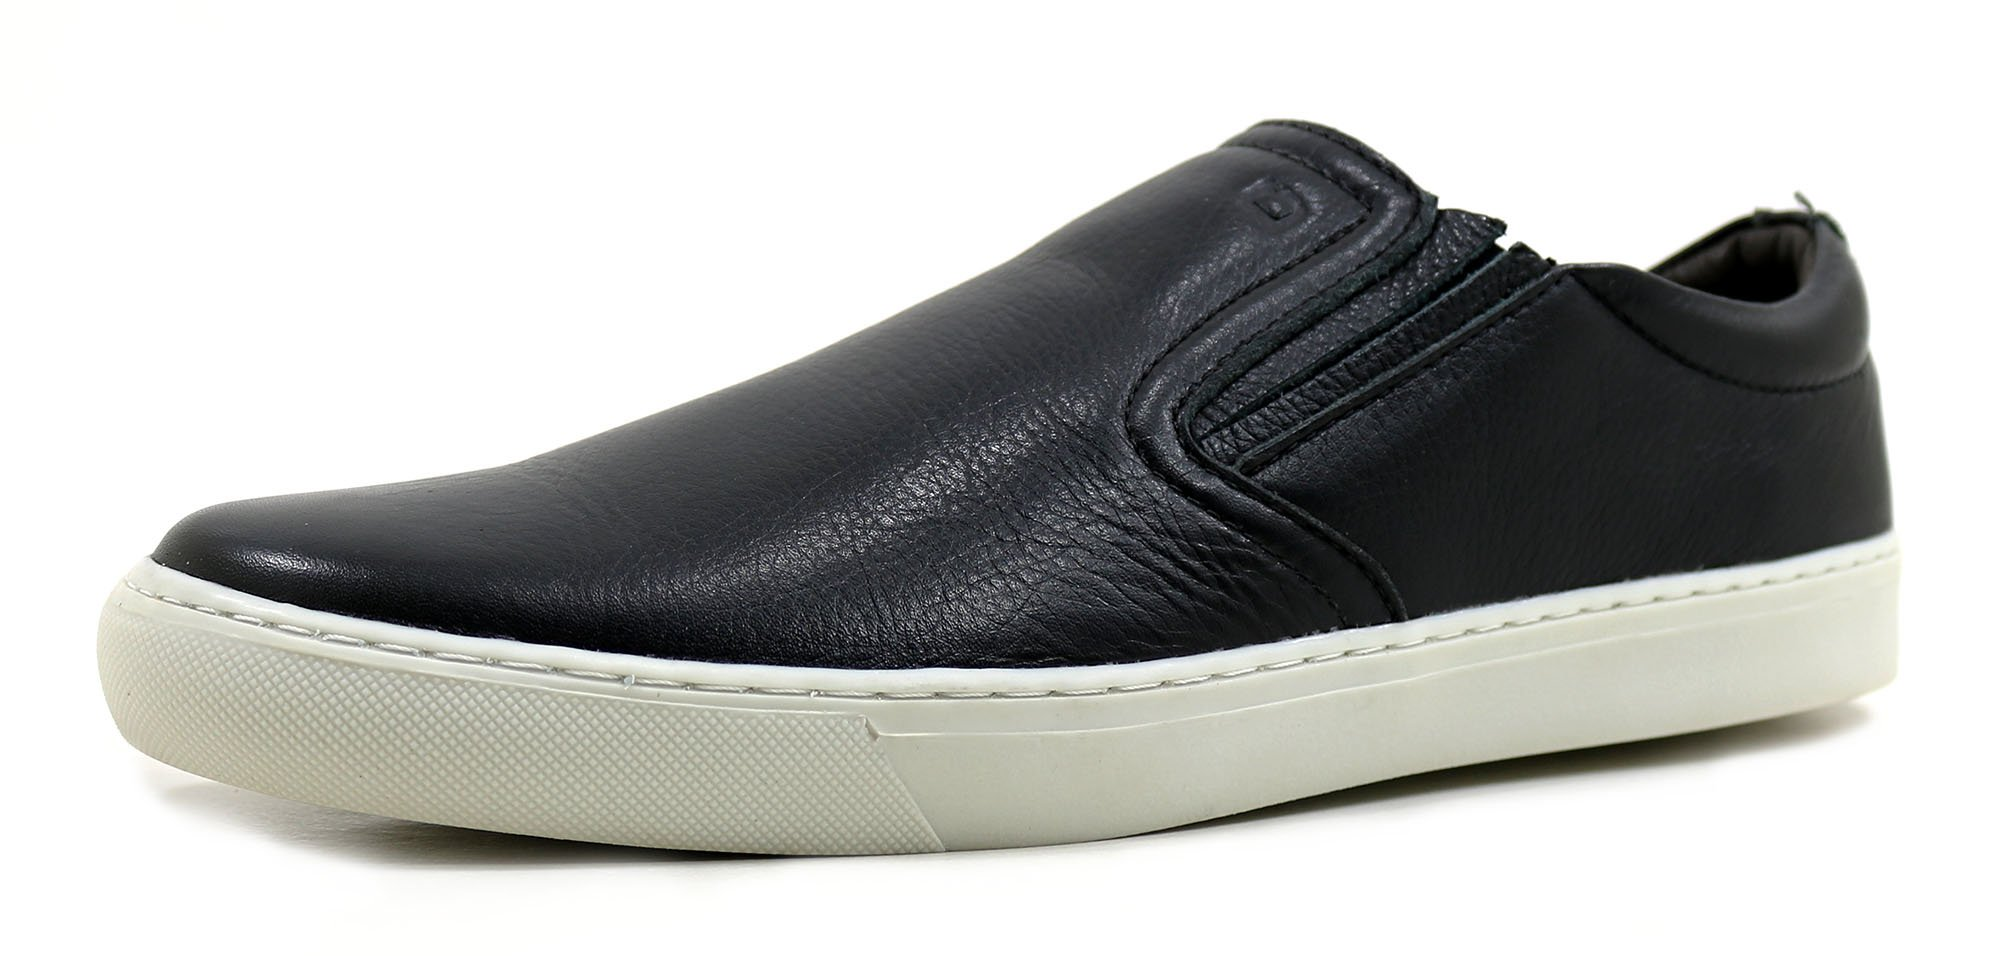 9b16664ed1 Slip On Leeds Preto - Loja Orlandelli Calçados - Sapatos Masculinos